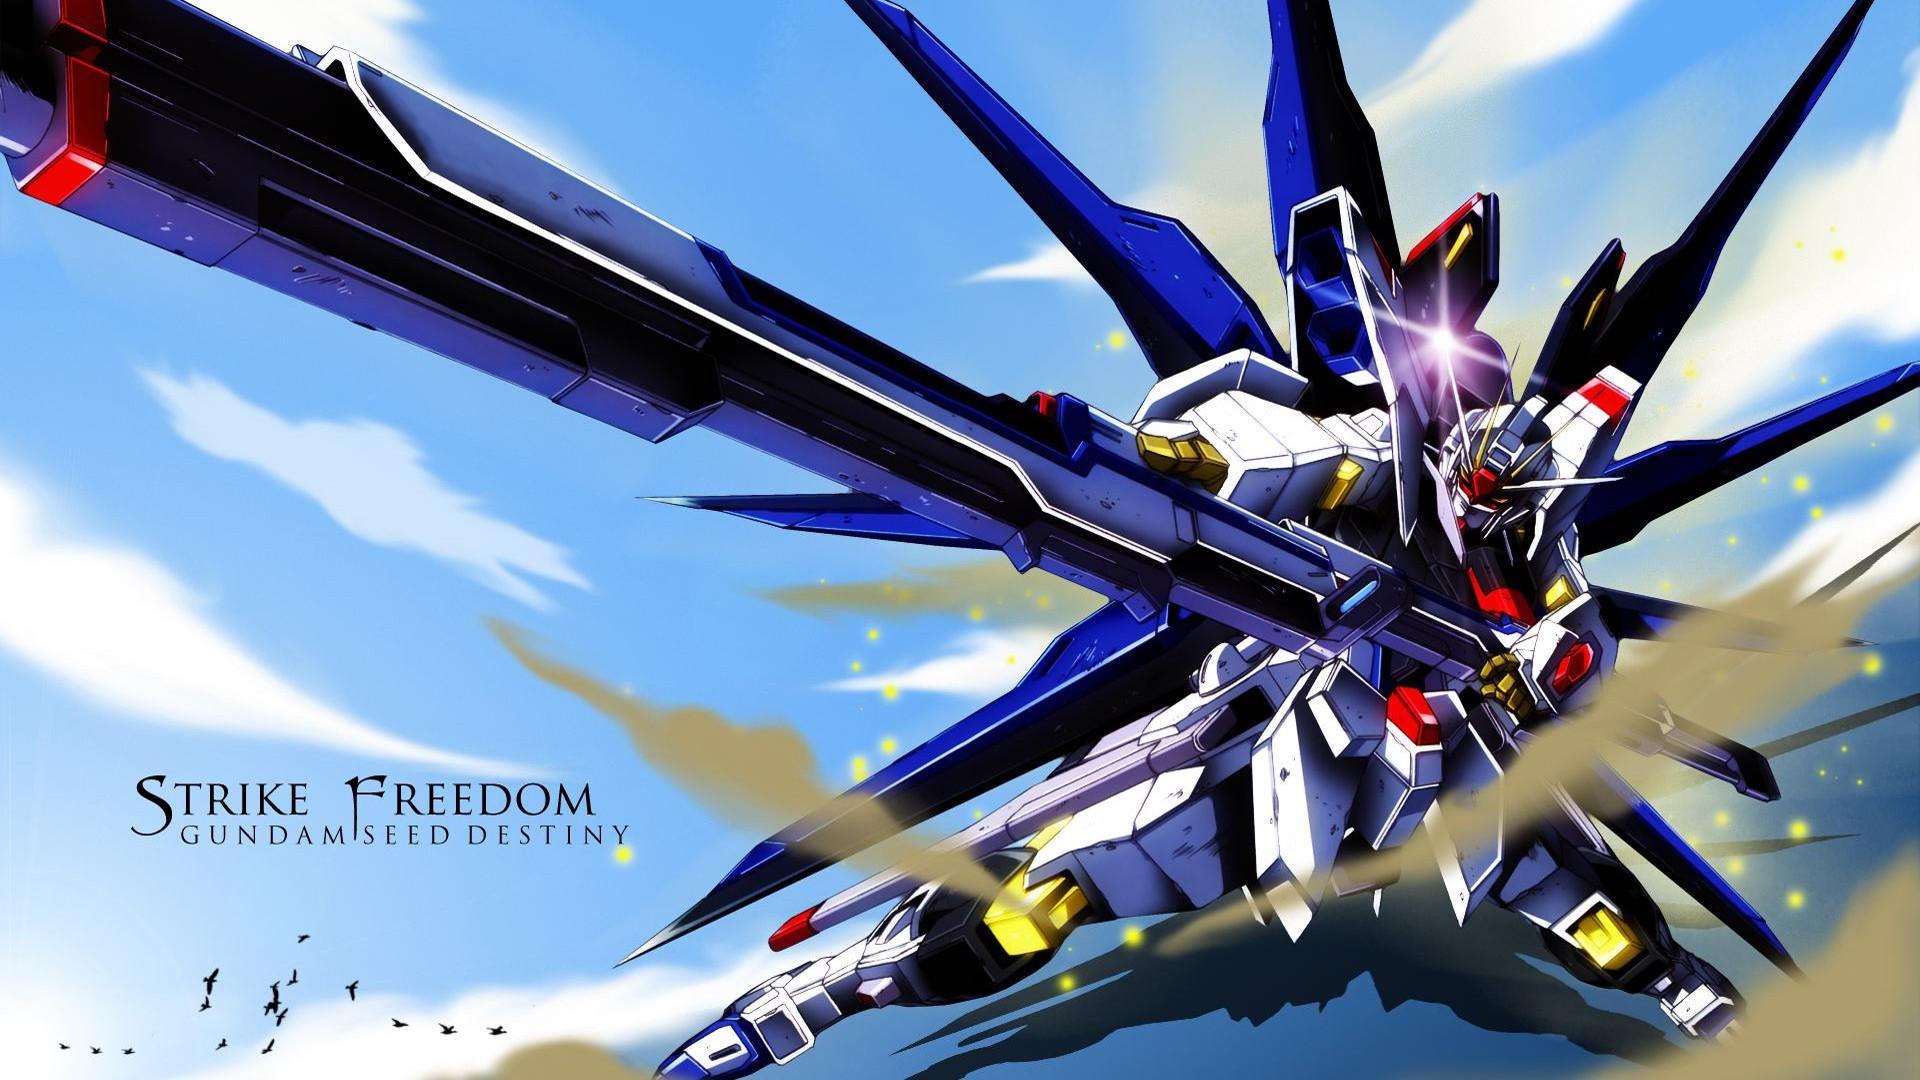 Unduh 72 Wallpaper Anime Gundam Hd Gratis Terbaru